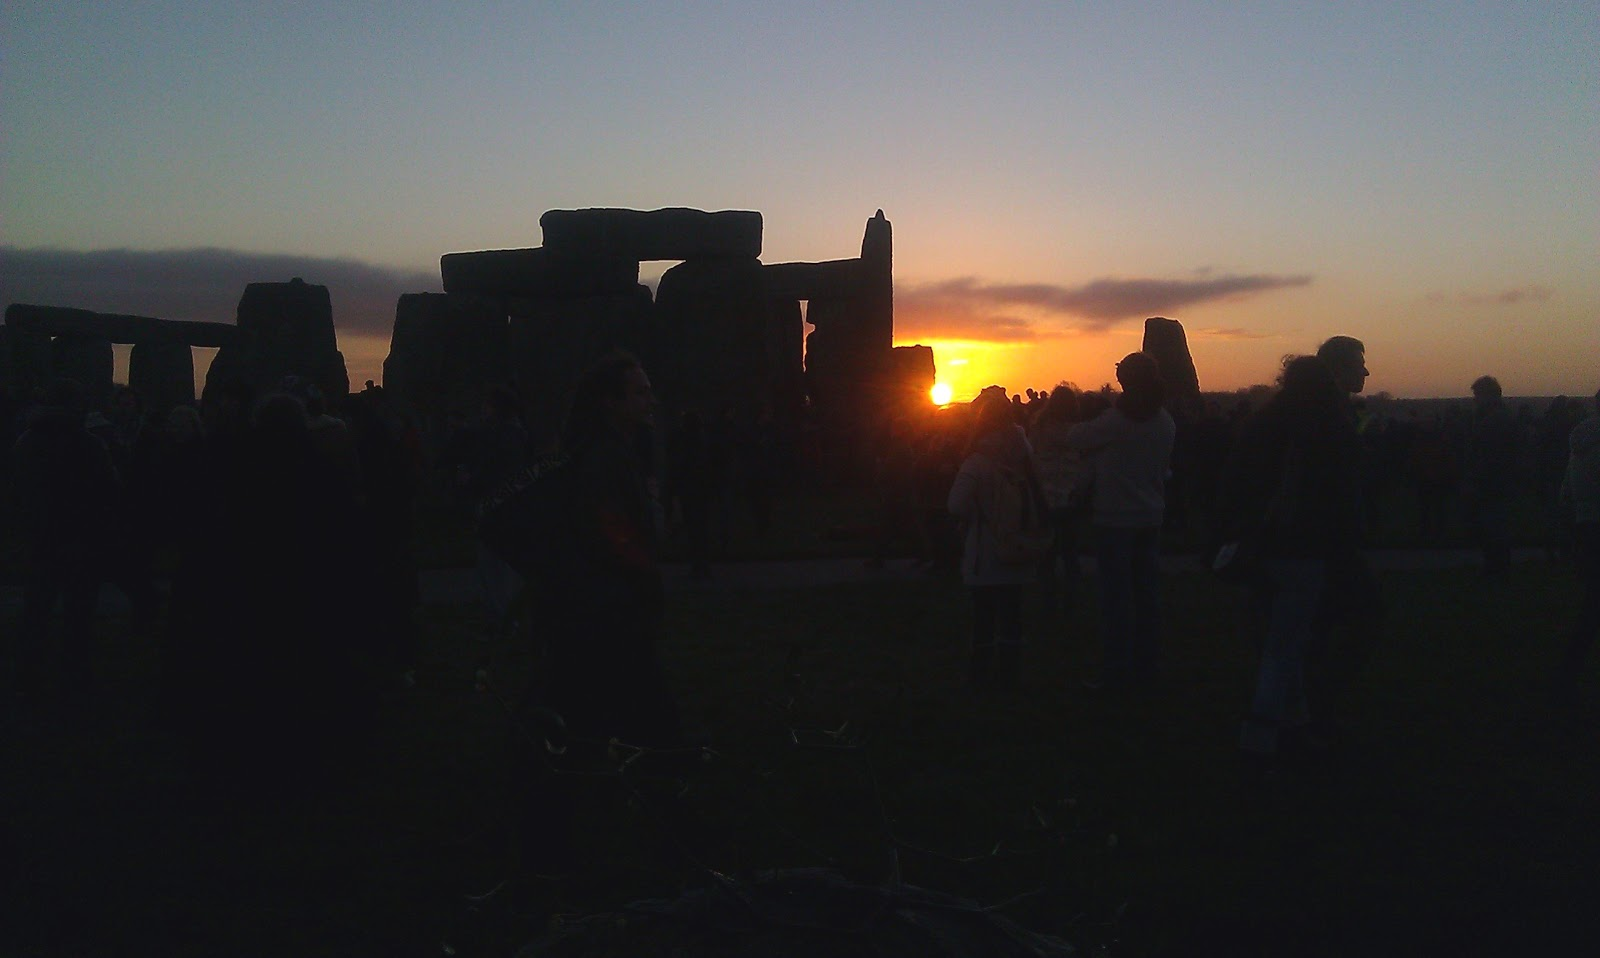 www.Sarsen.org: Stonehenge Midwinter Solstice Sunrise ...